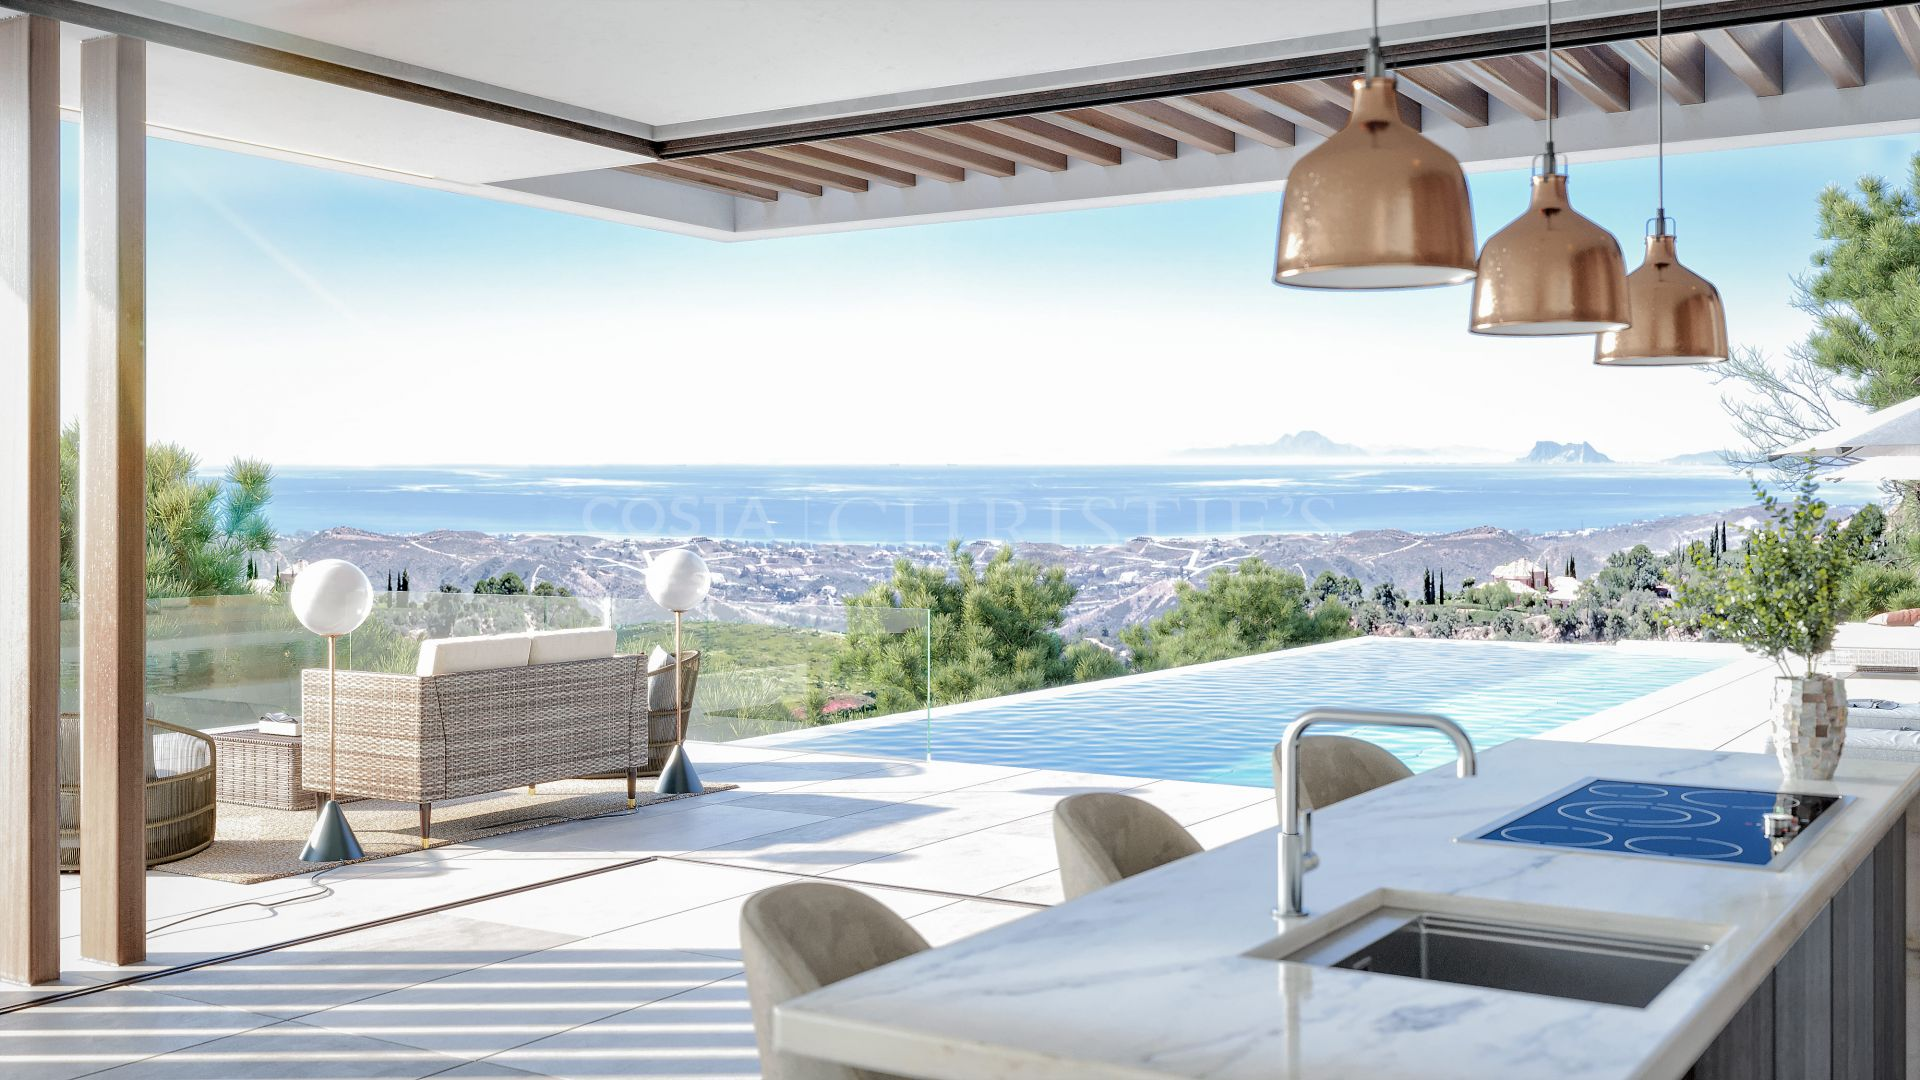 Marvelous Villa 14.4 in The Secret Marbella, Real de la Quinta | Christie's International Real Estate